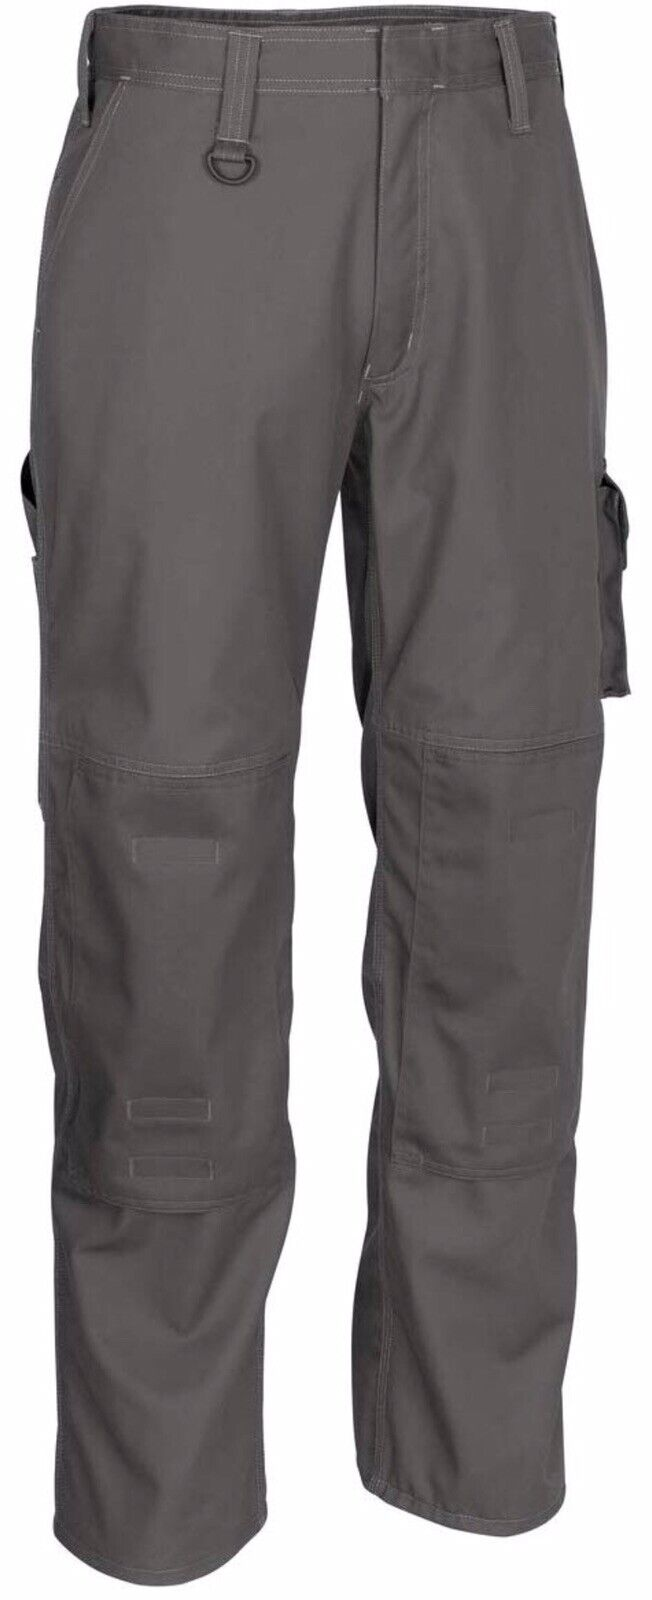 Mascot Biloxi Trousers 12355-630-18-90C48 L90 C48 (32.5 35), Dark Anthracite